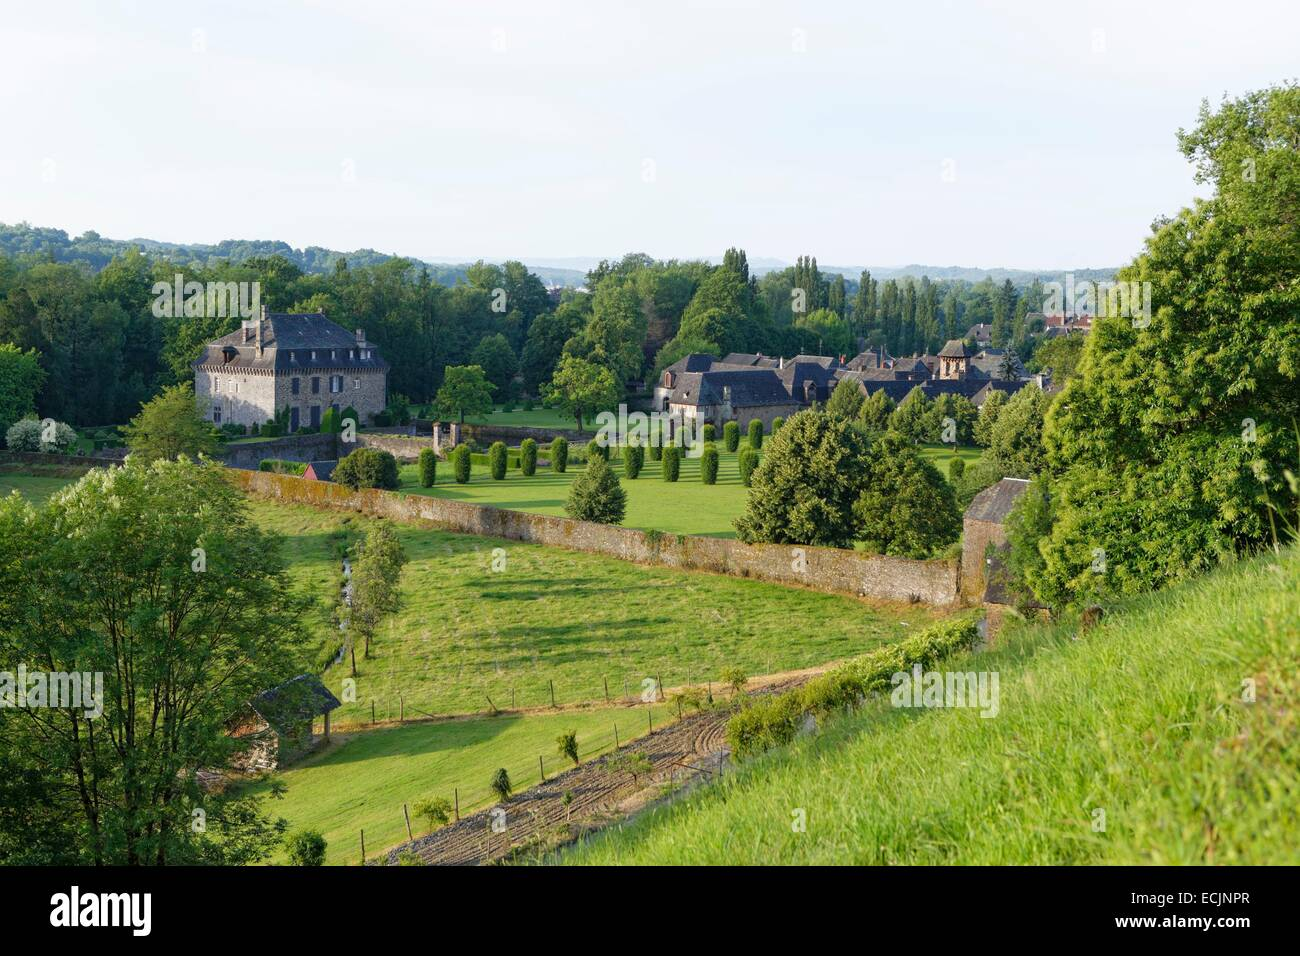 France, Correze, Le Saillant, castle of Mirabeau - Stock Image